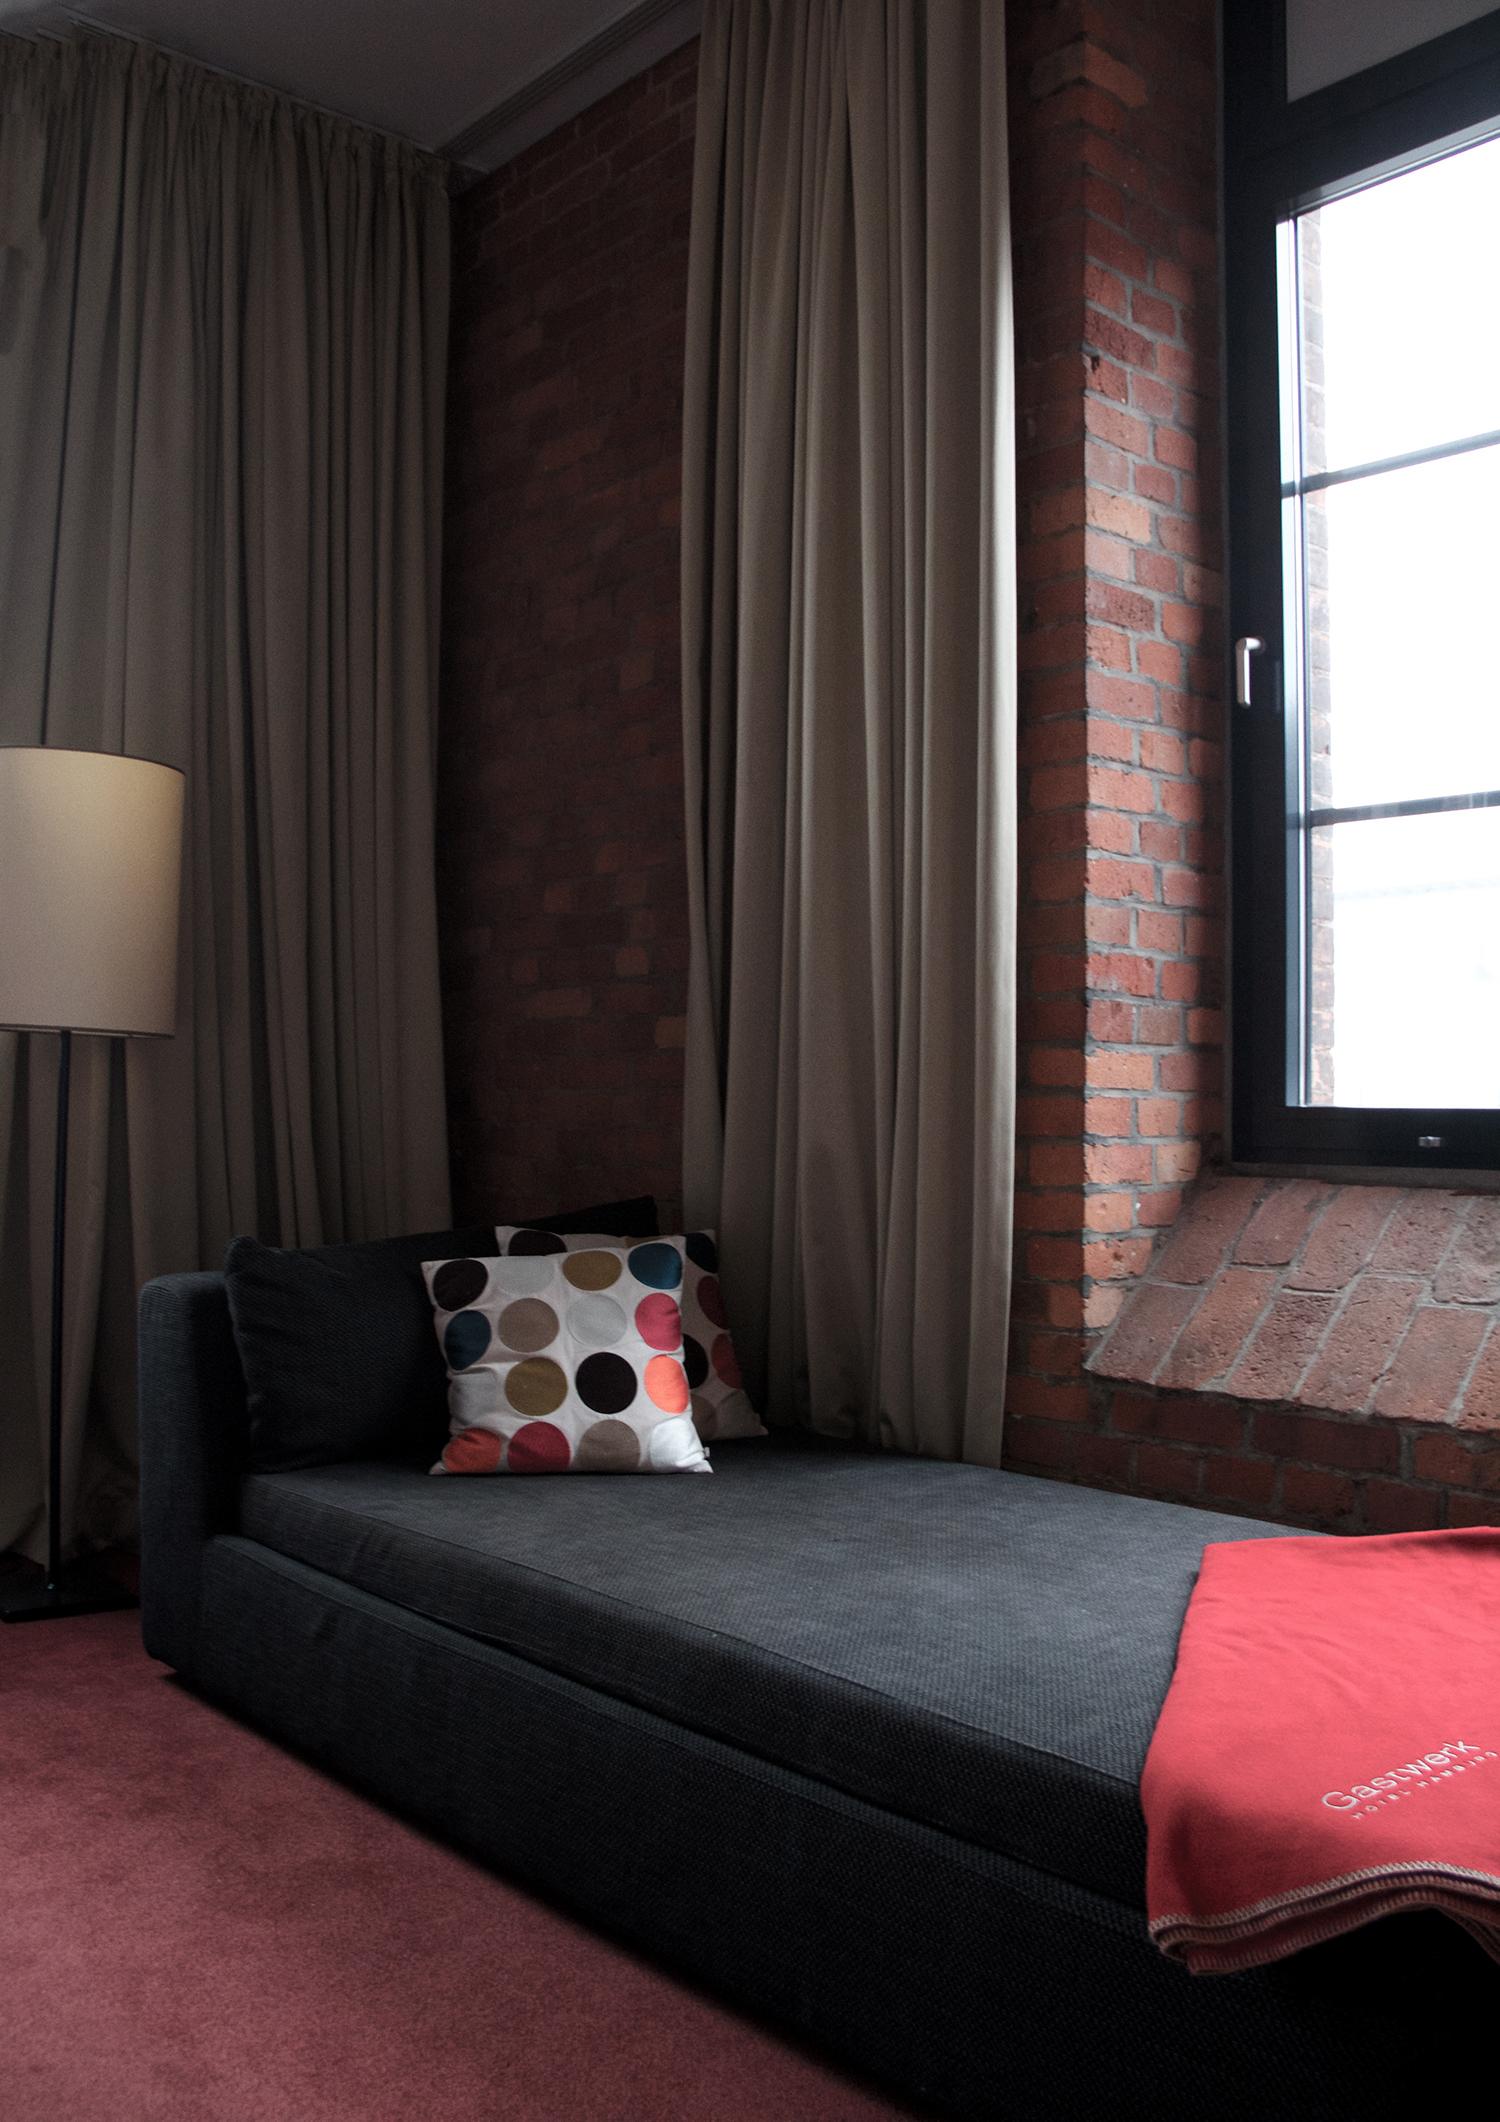 georgmallner_gastwerkhamburg_gastwerk_hamburg_gastwerkhotel_hotel_5starhotel_luxuryhotel_spahotel_spa_wellness_brickwalls_loft_lofthotel_13